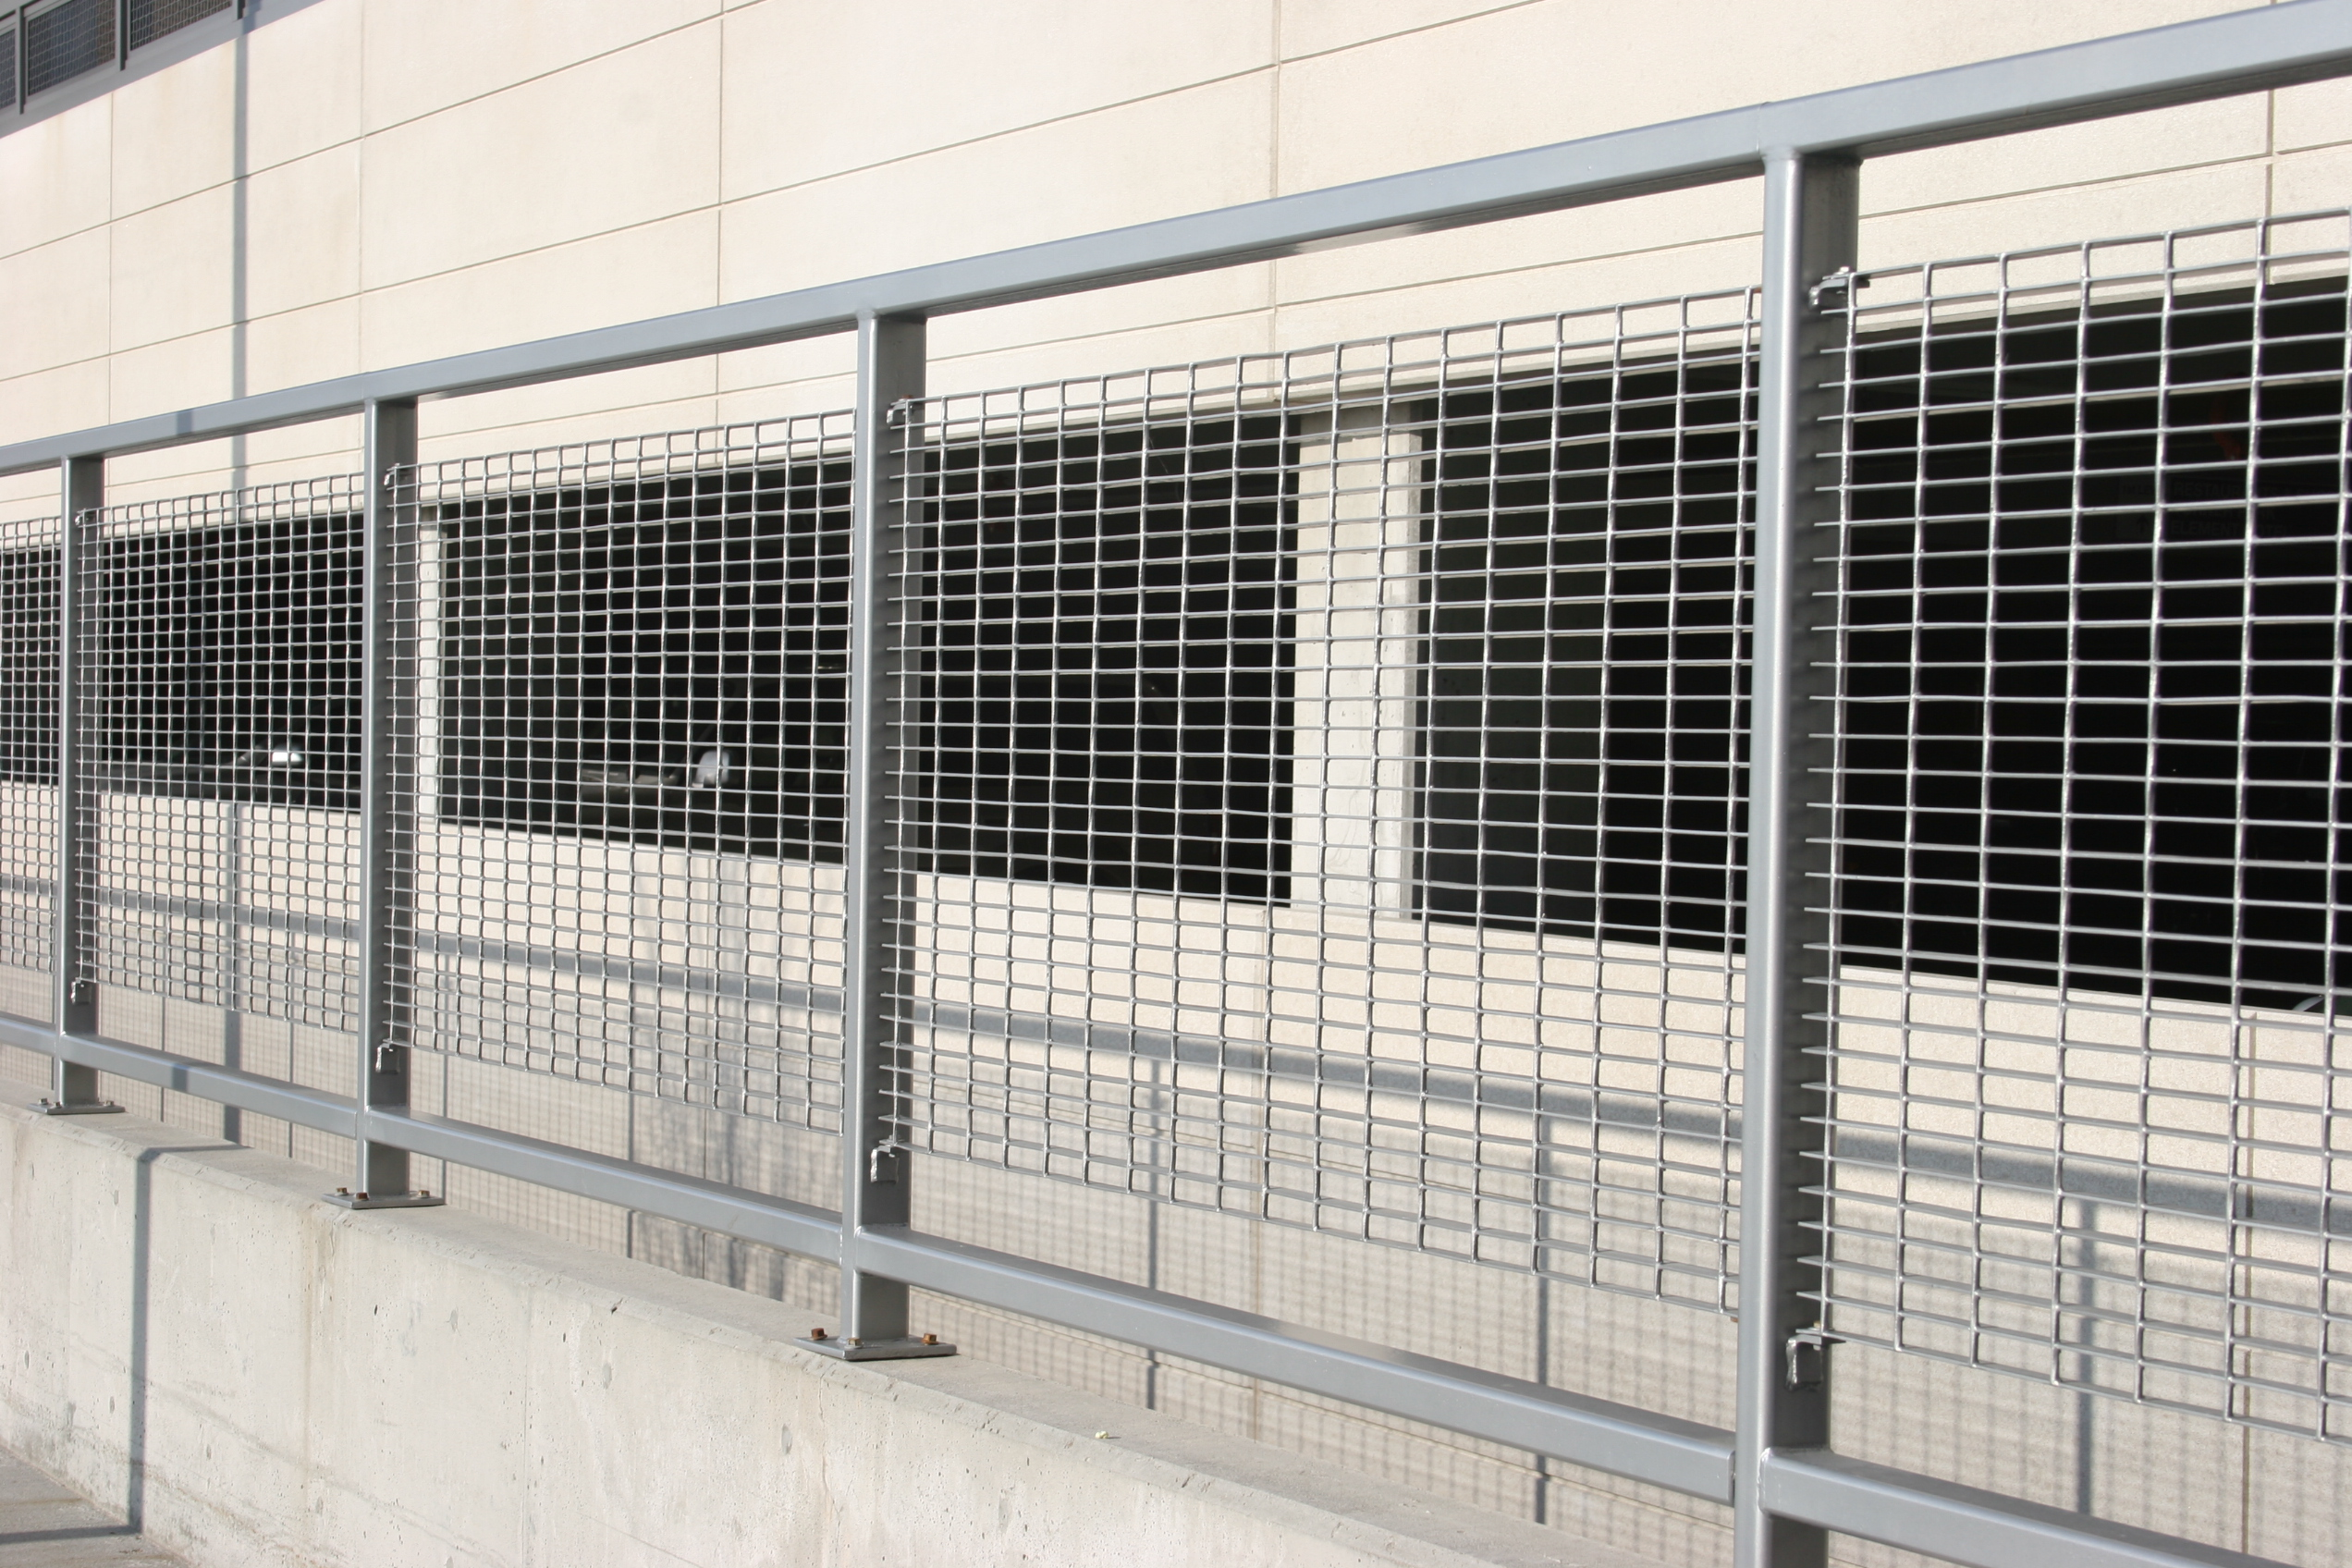 PalmSHIELD announces bar grating infill panels CAD drawings